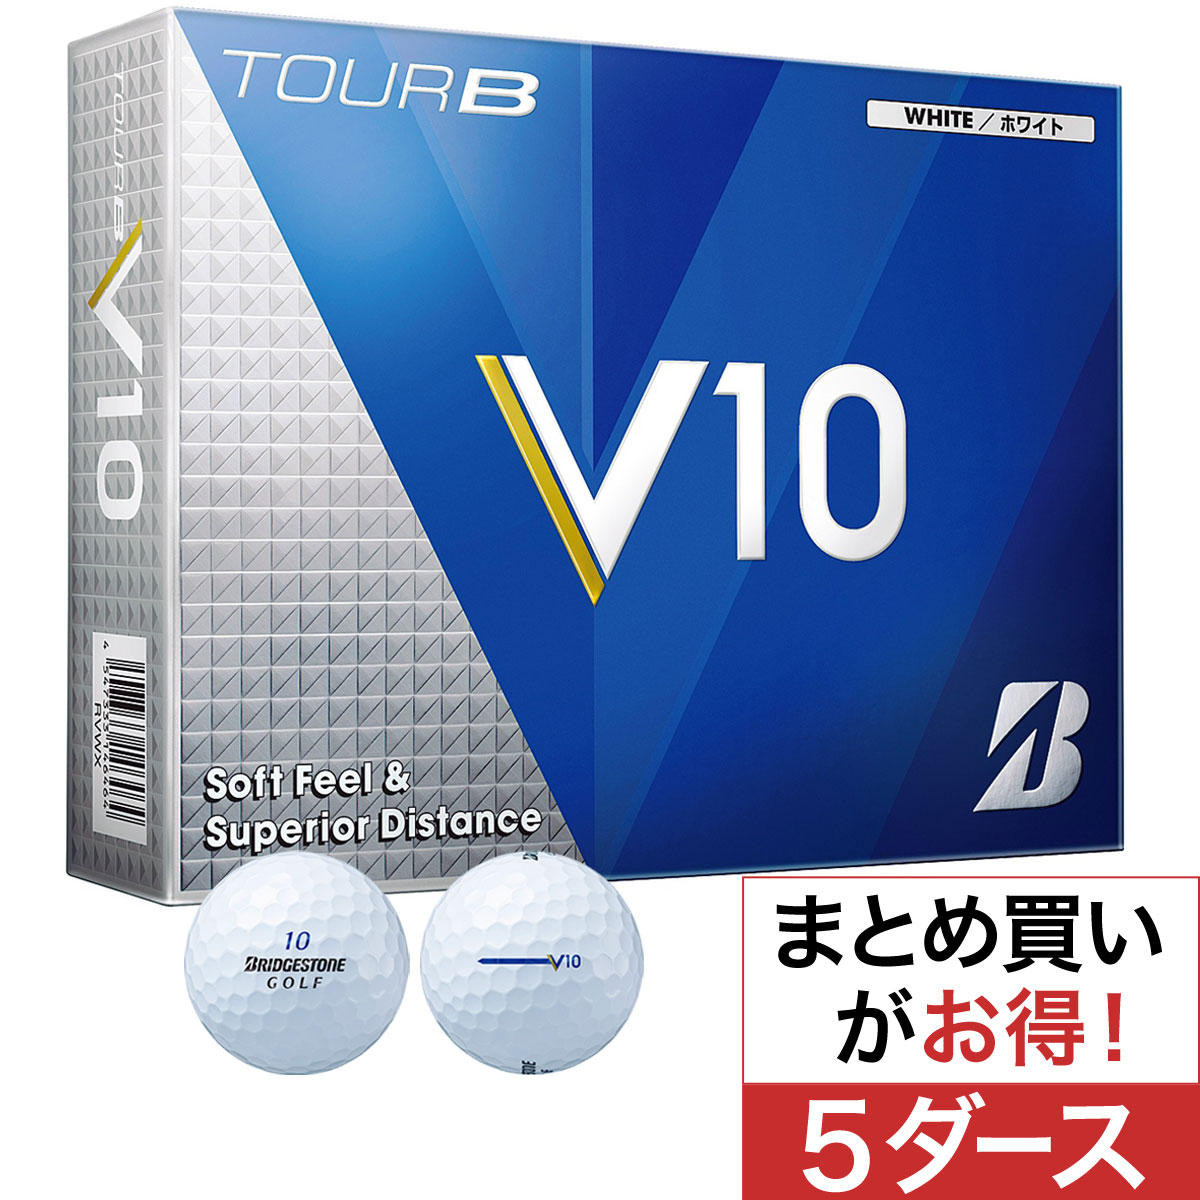 TOUR B V10 ボール 5ダースセット